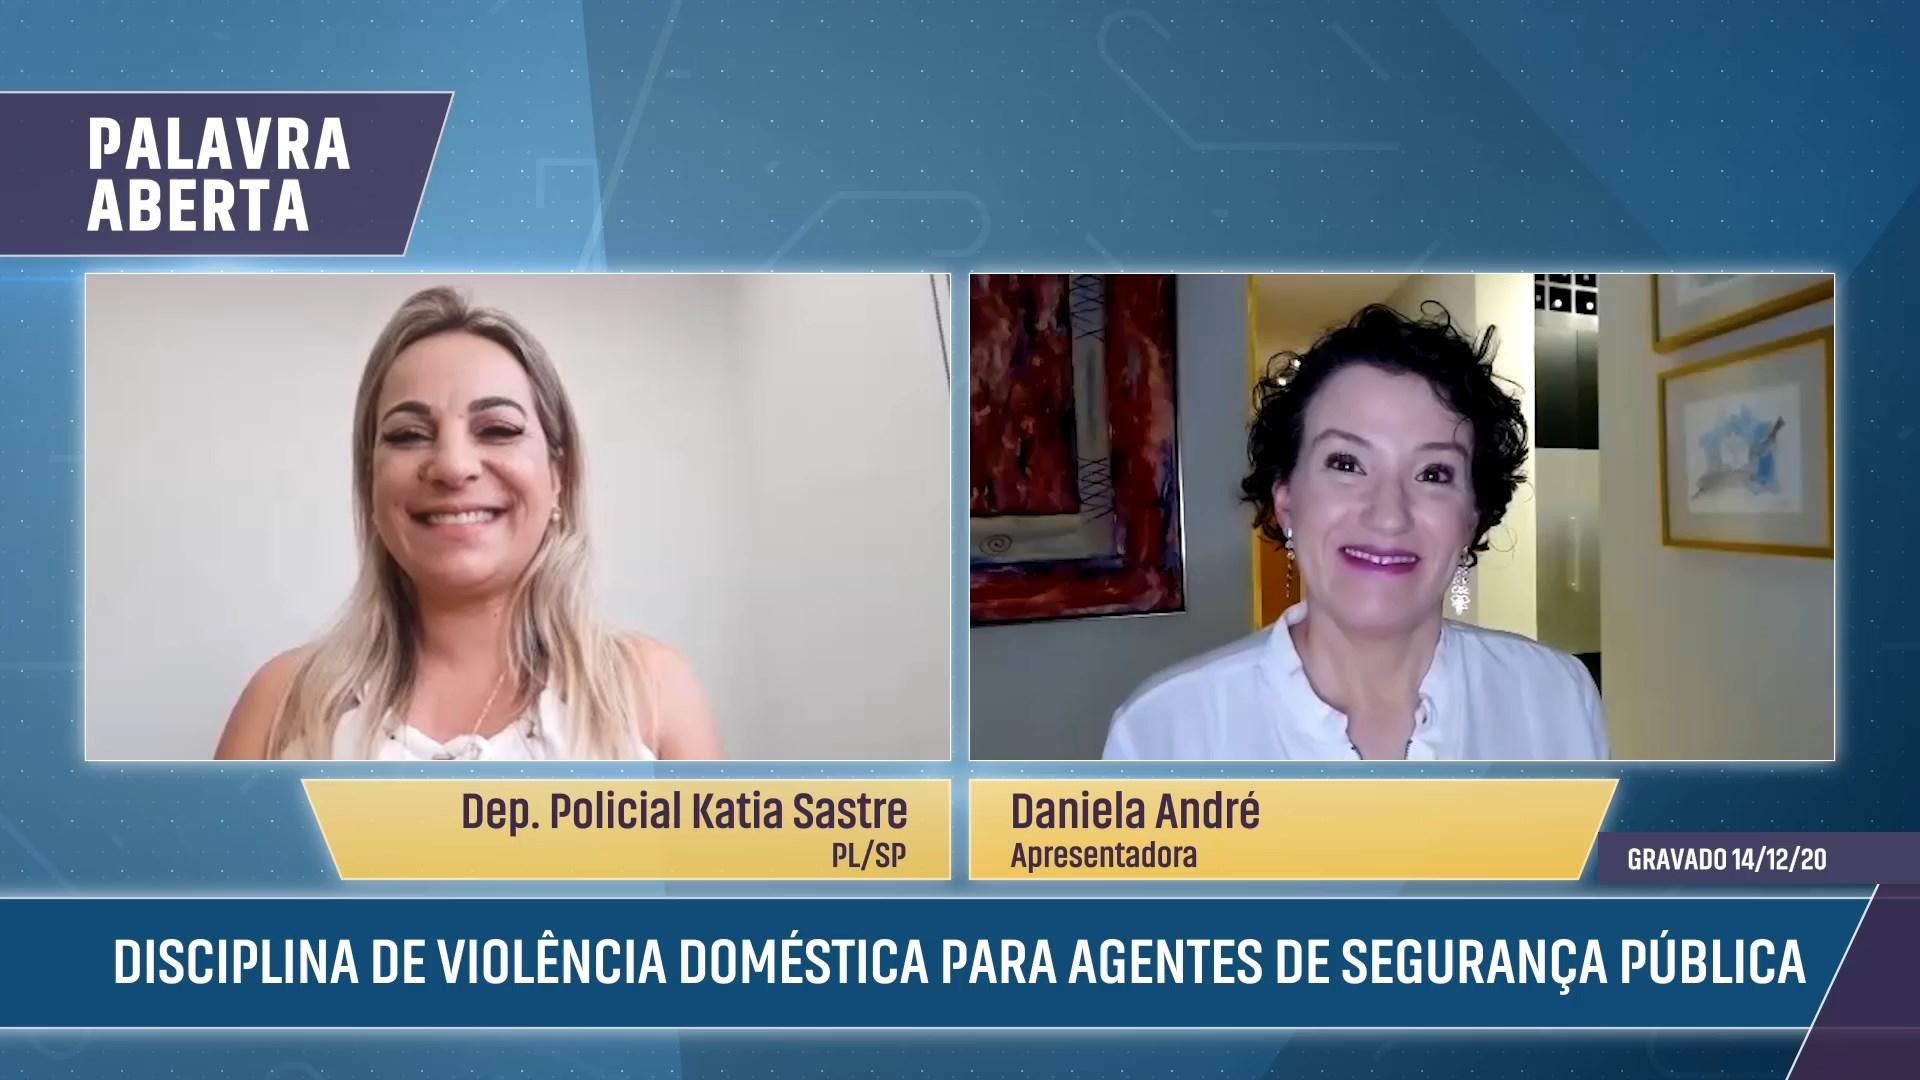 Disciplina de violência doméstica para agentes de segurança pública